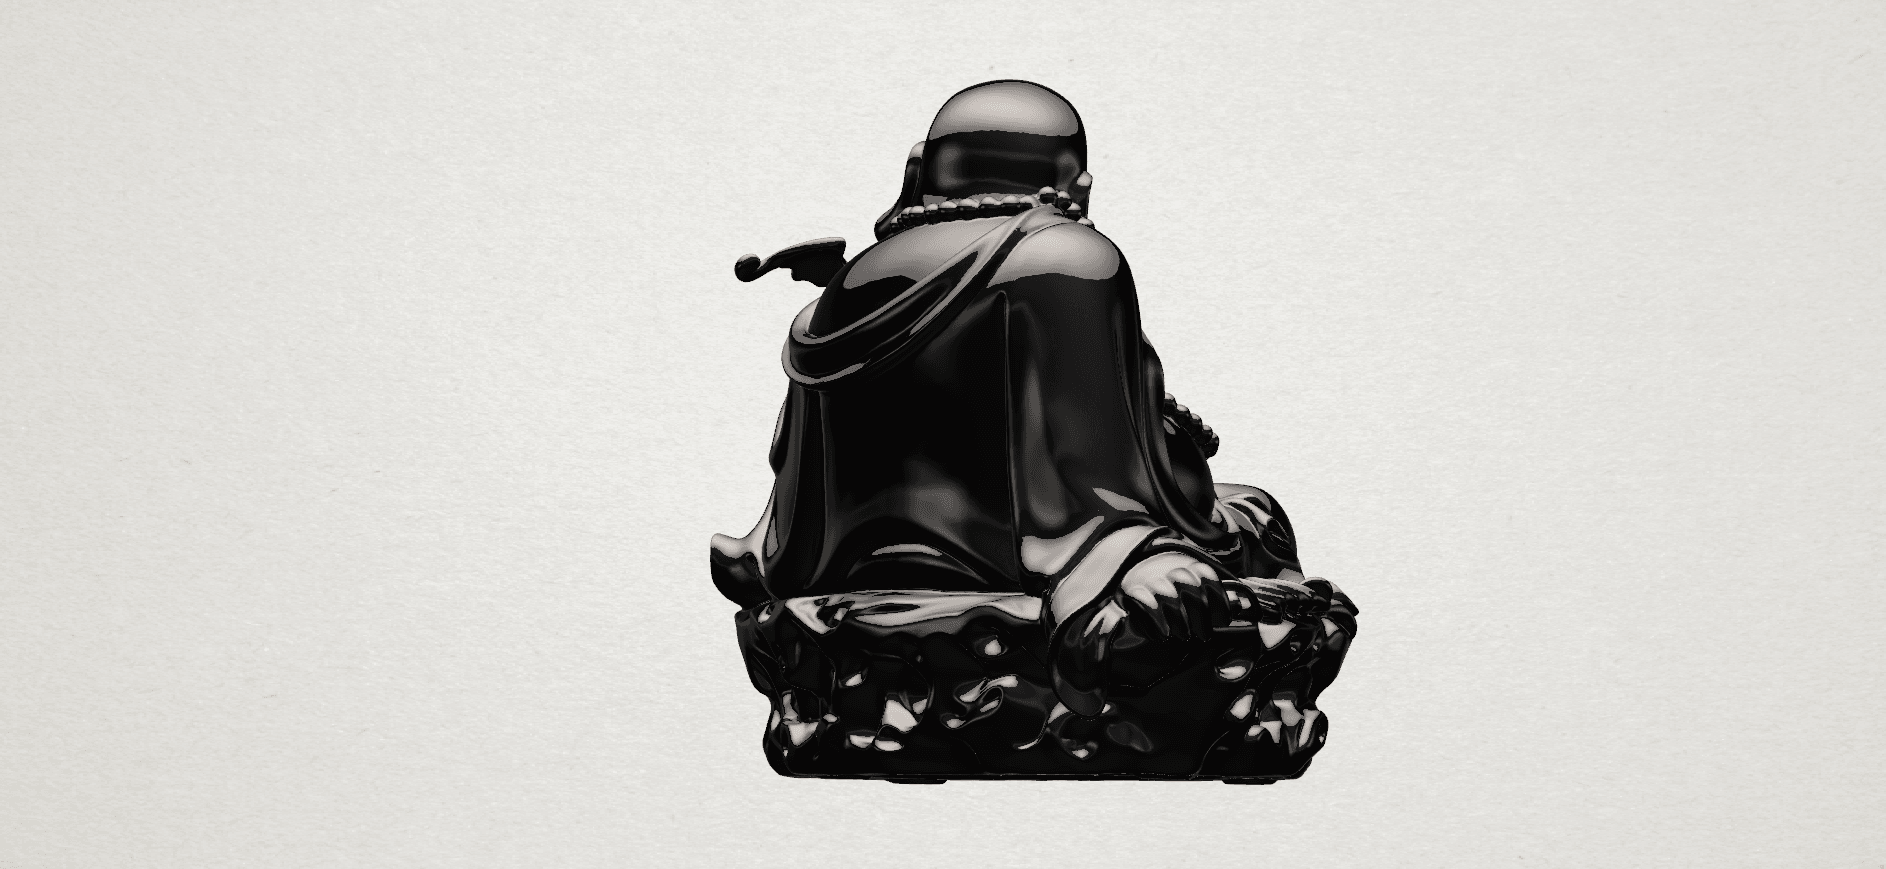 Metteyya Buddha 06 - B04.png Download free STL file Metteyya Buddha 06 • 3D print model, GeorgesNikkei